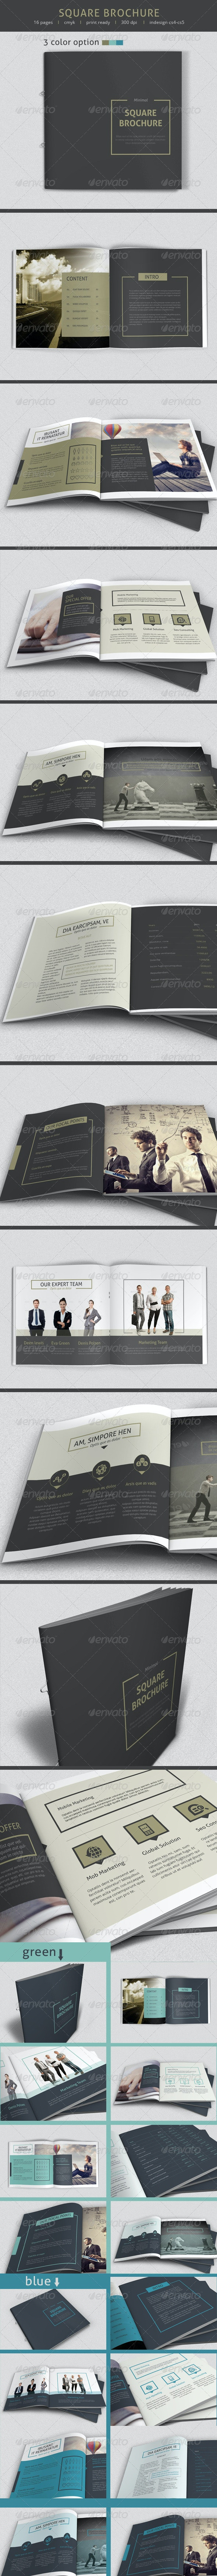 Minimal Square Brochure - Informational Brochures